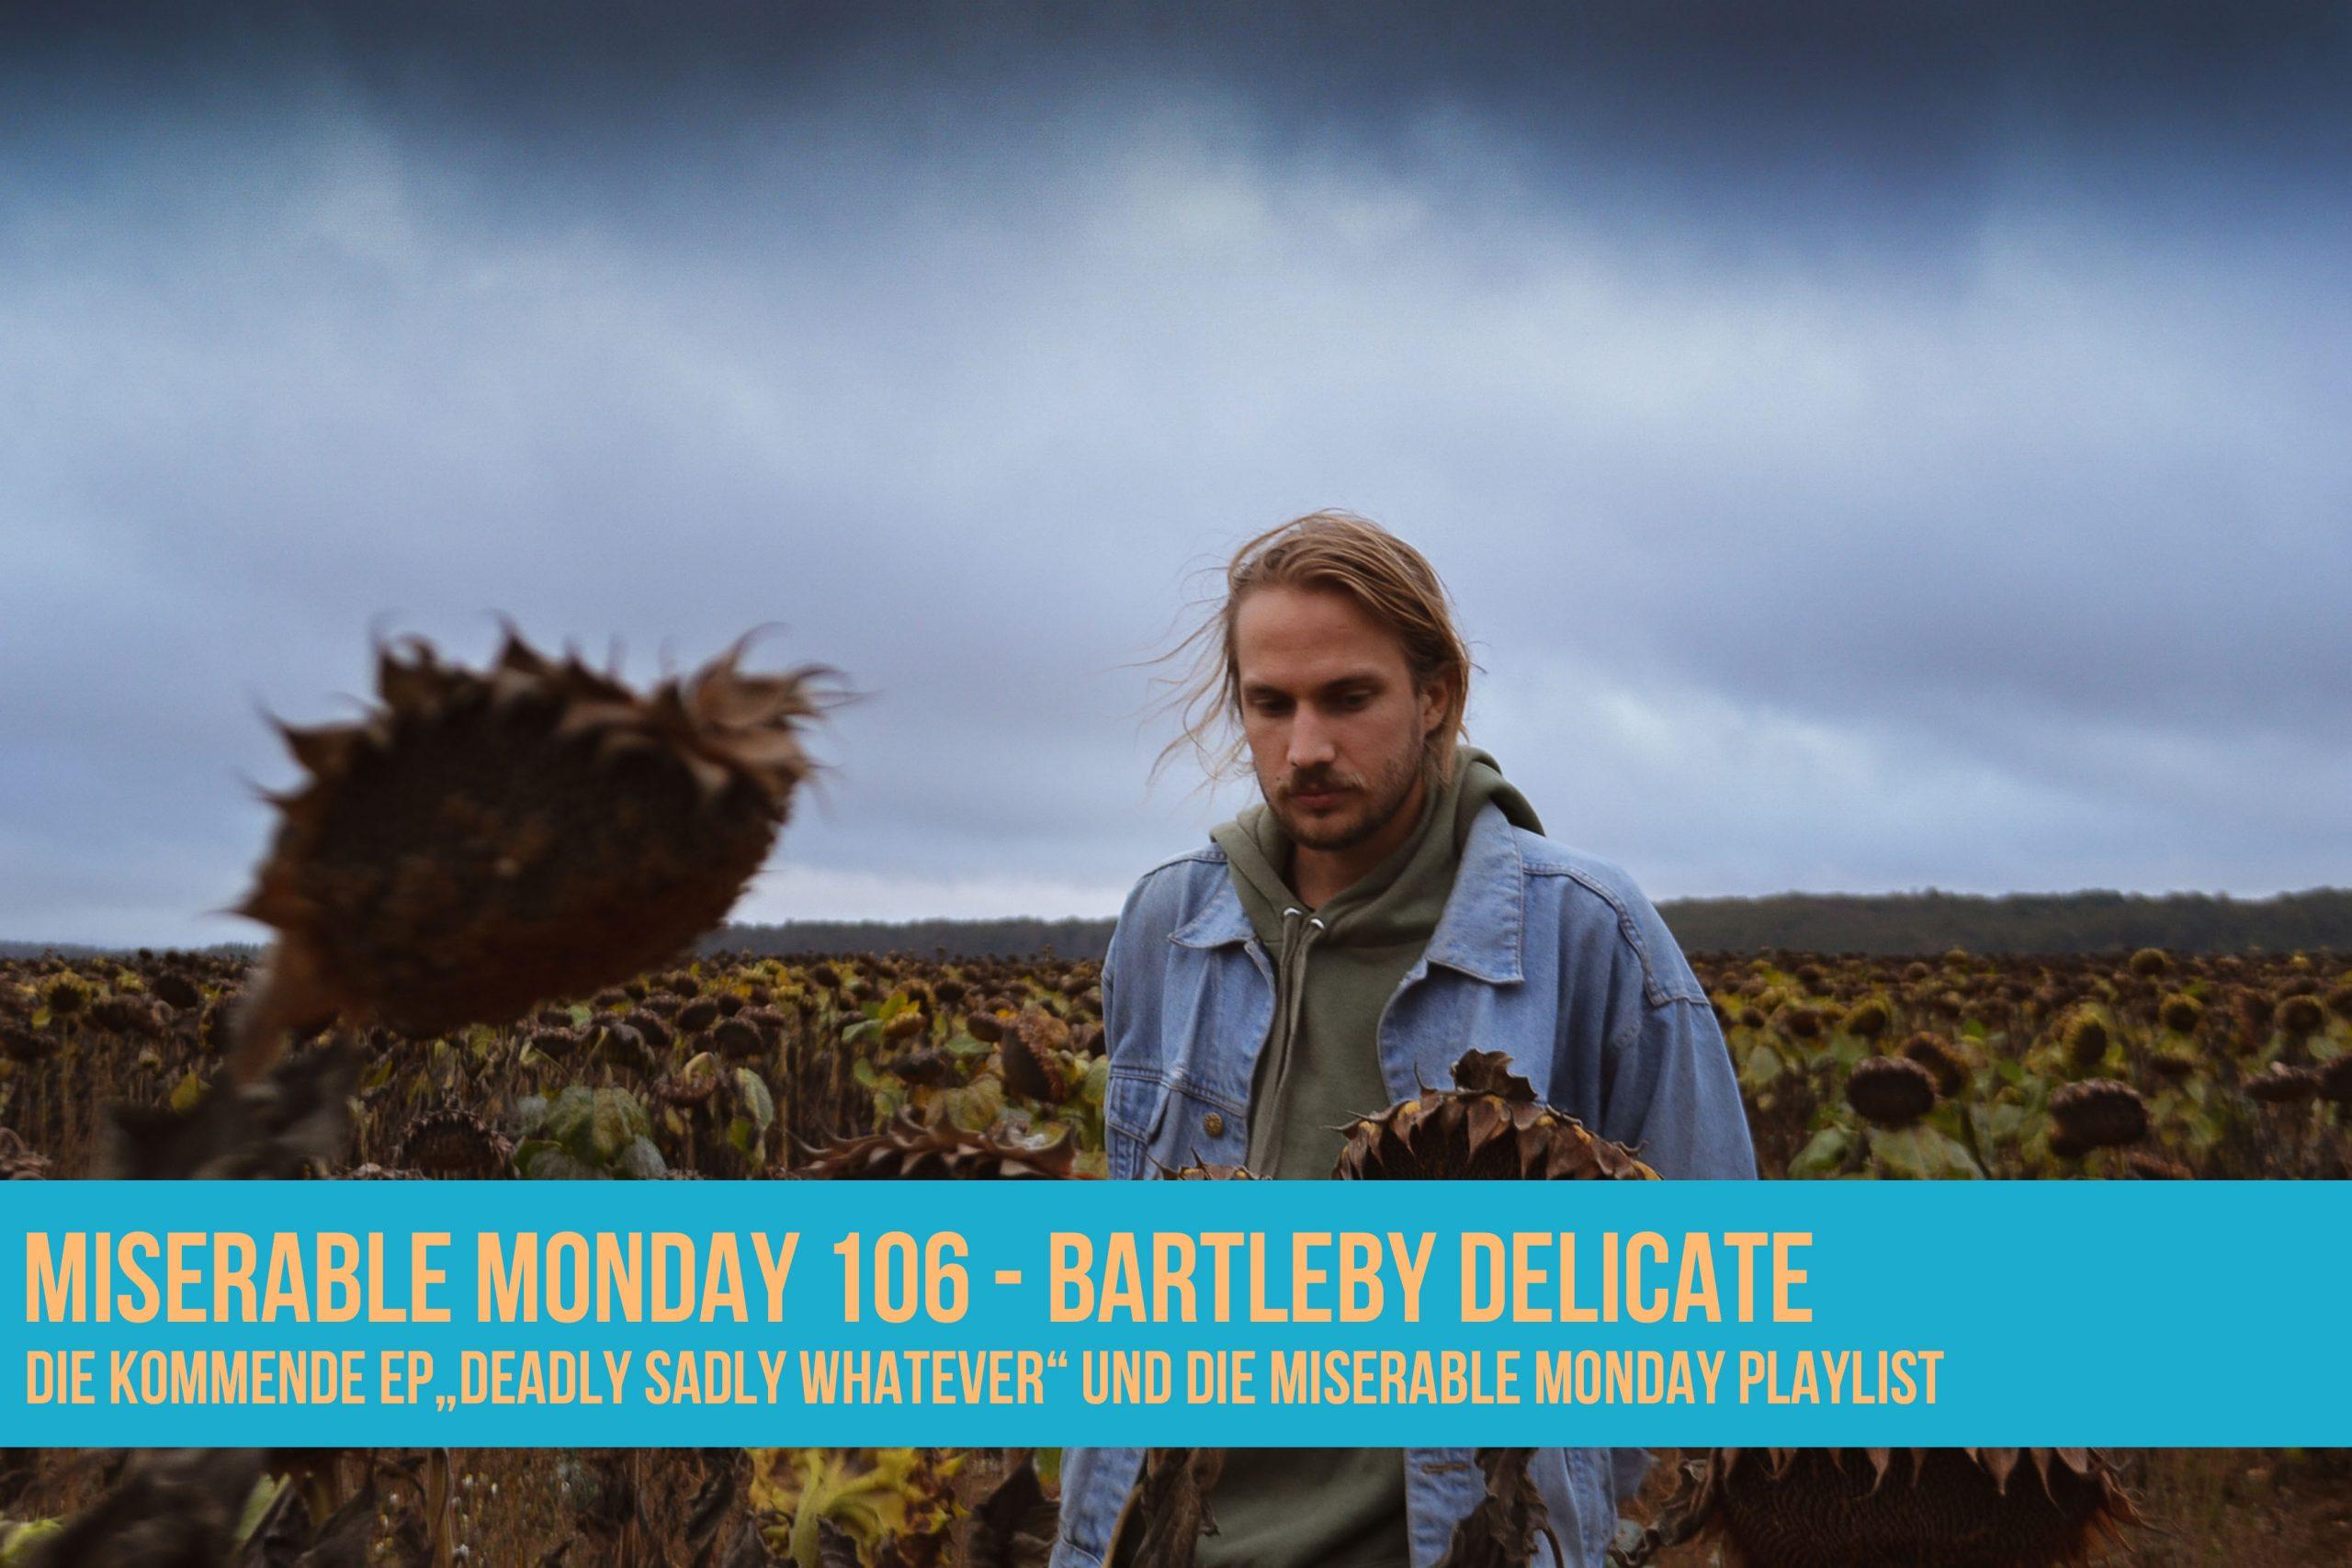 106 - Bartleby Delicate